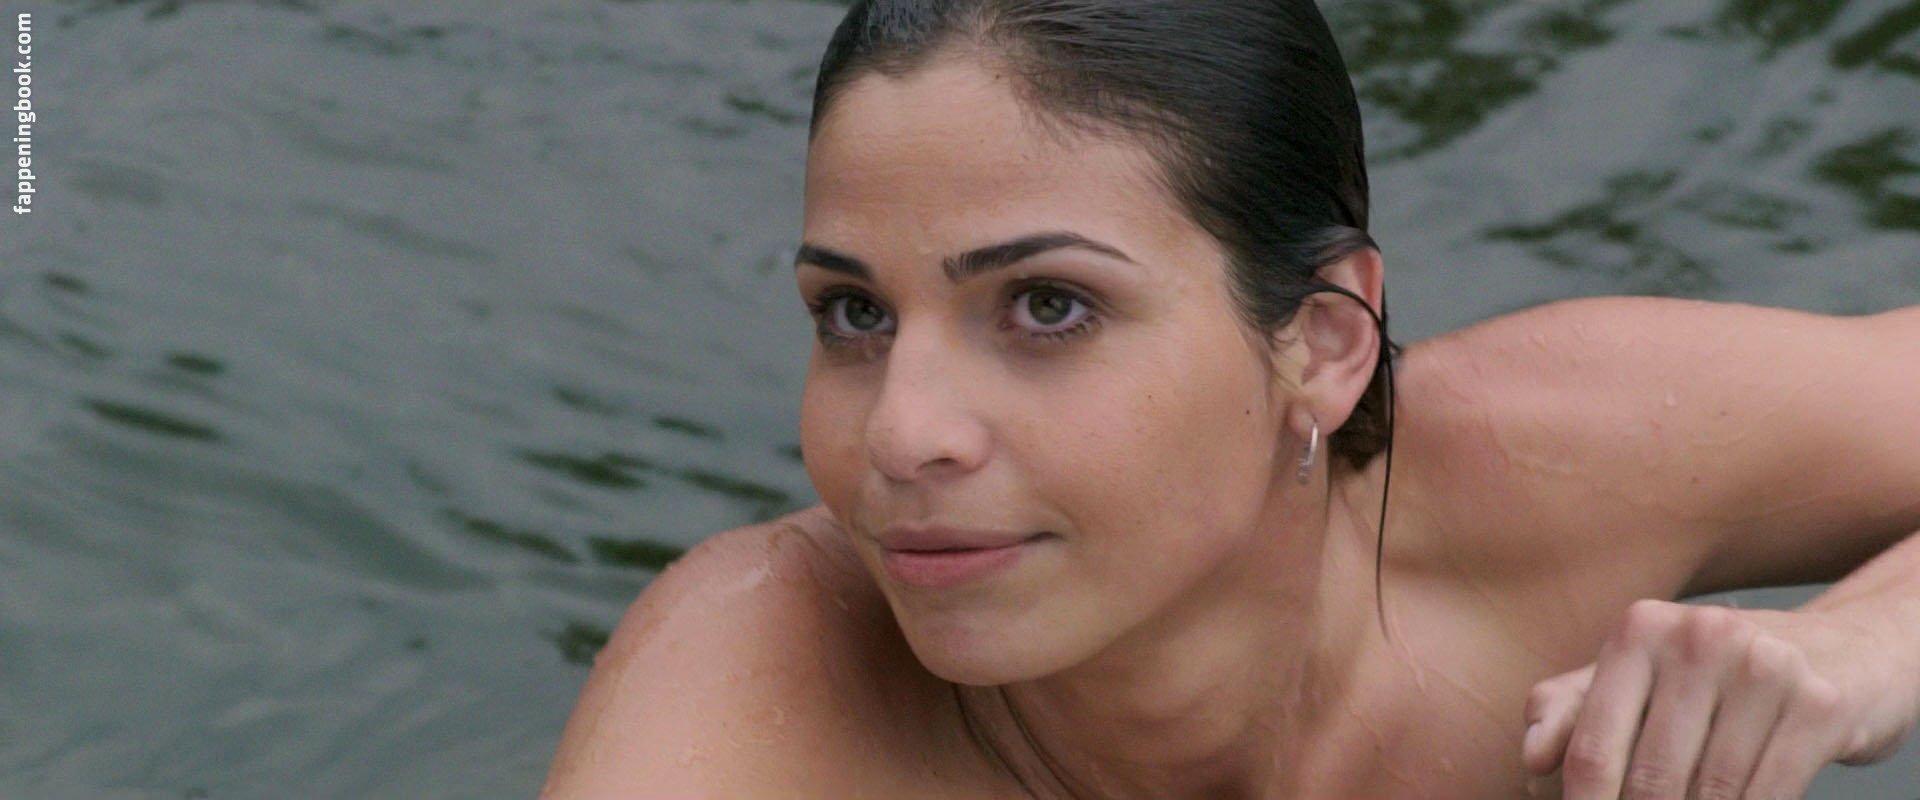 Ana Ayora Nude ana ayora nude, sexy, the fappening, uncensored - photo